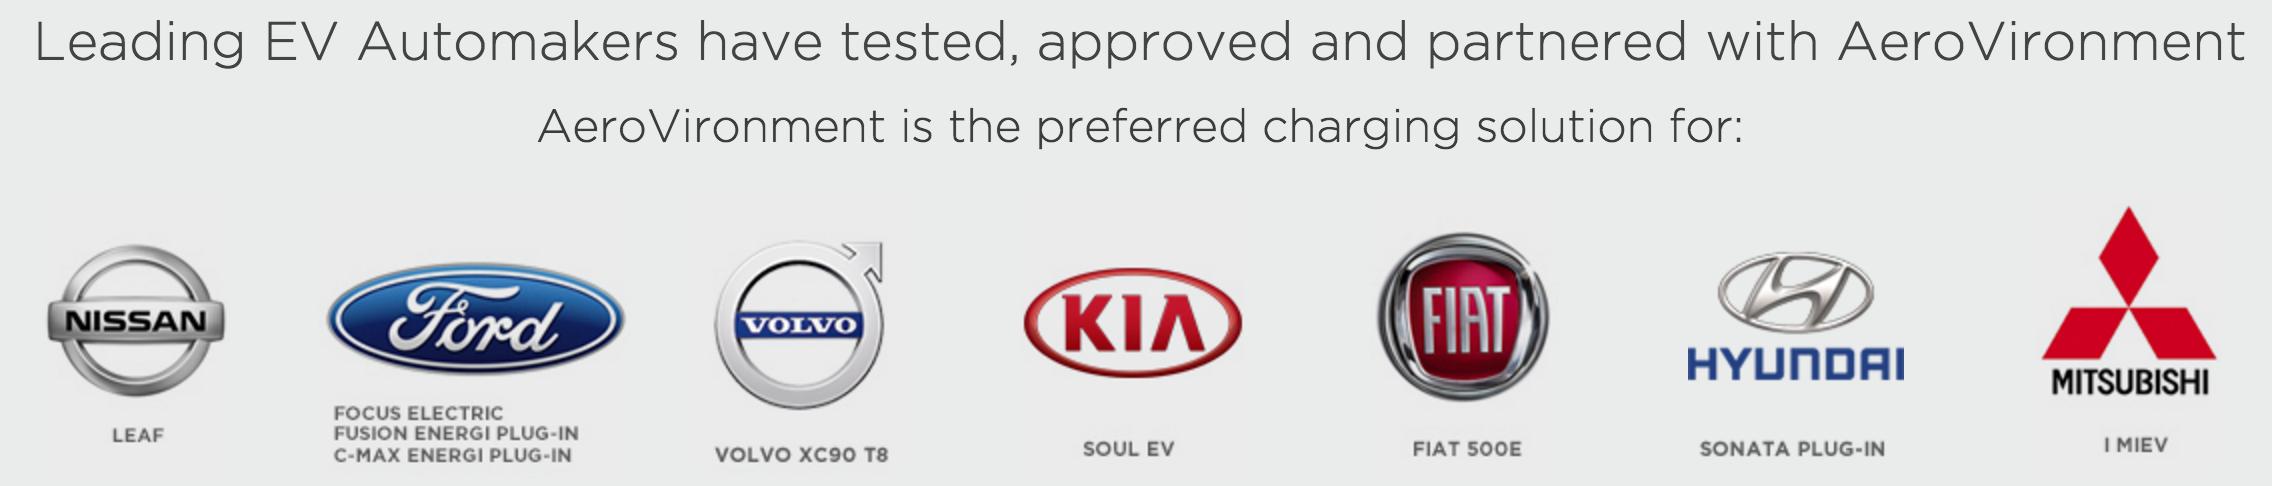 Aerovironment-partners-EV-chargers